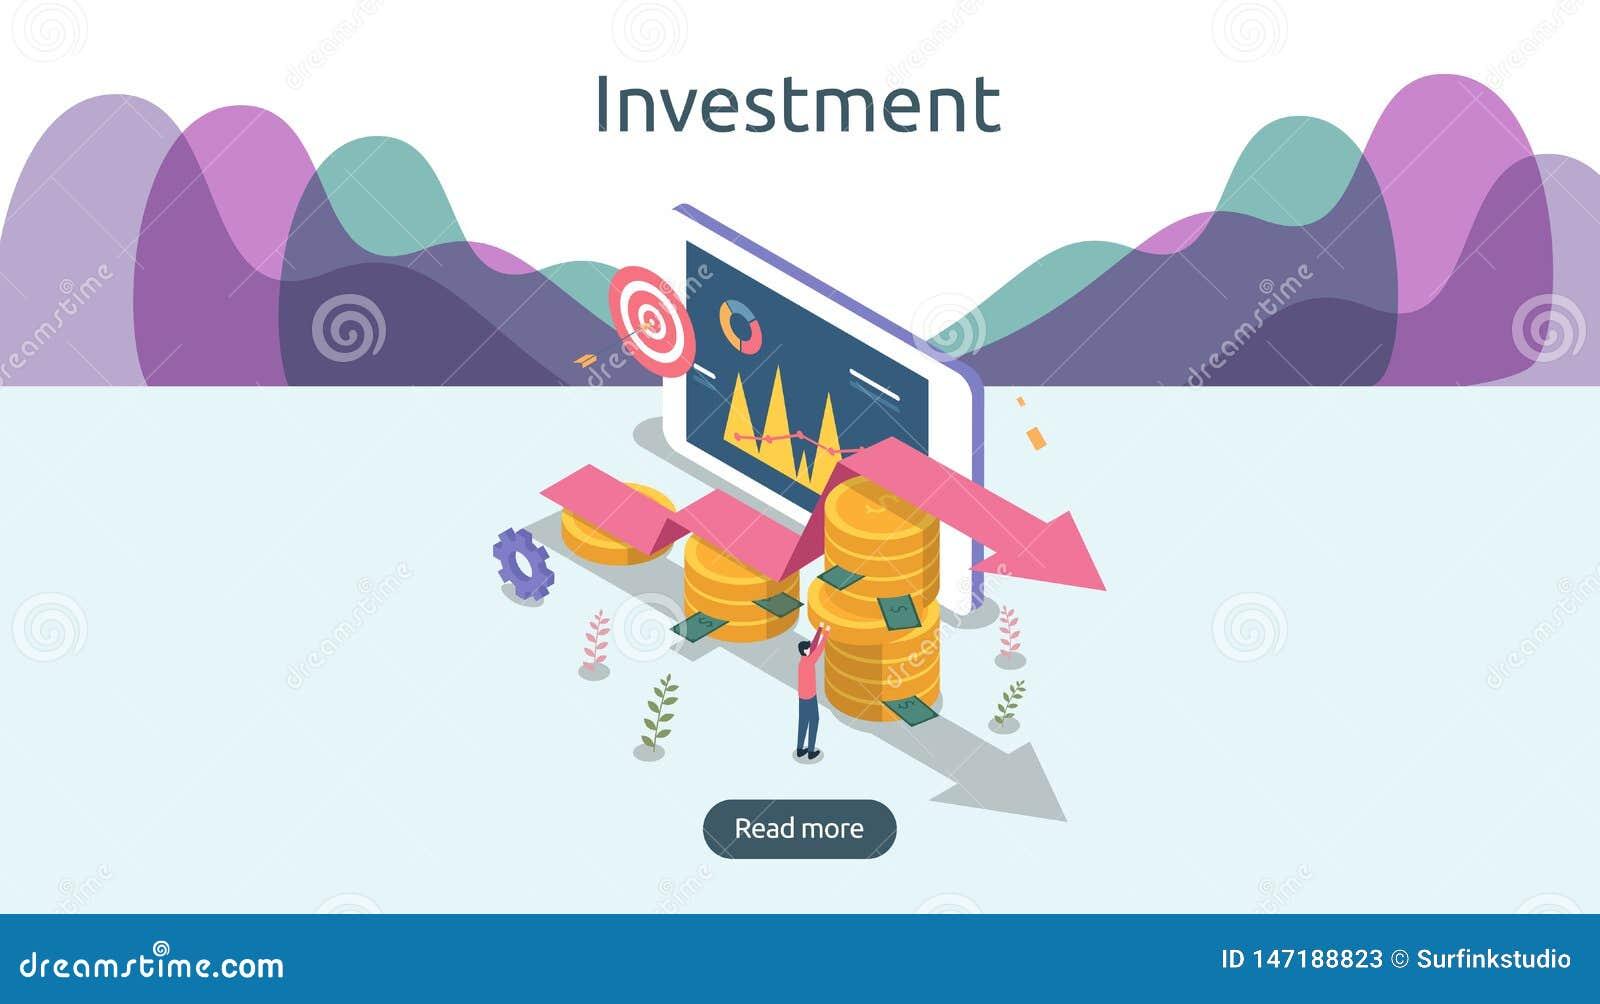 management or return on investment concept. online business strategic for financial analysis. isometric design vector illustration